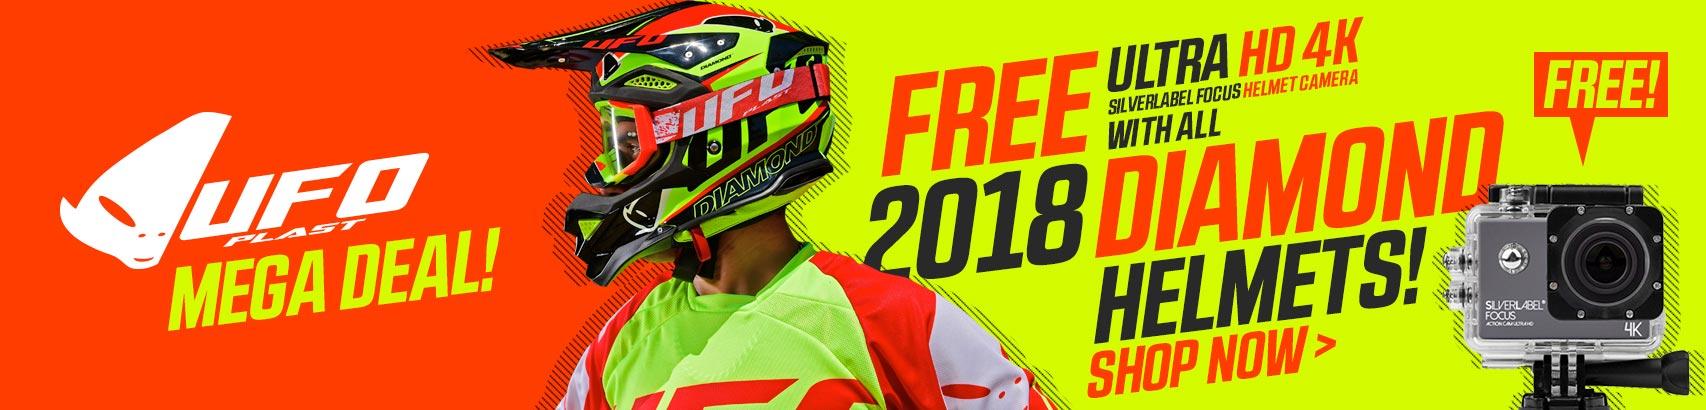 Free 4K Cam with every Diamond Helmet